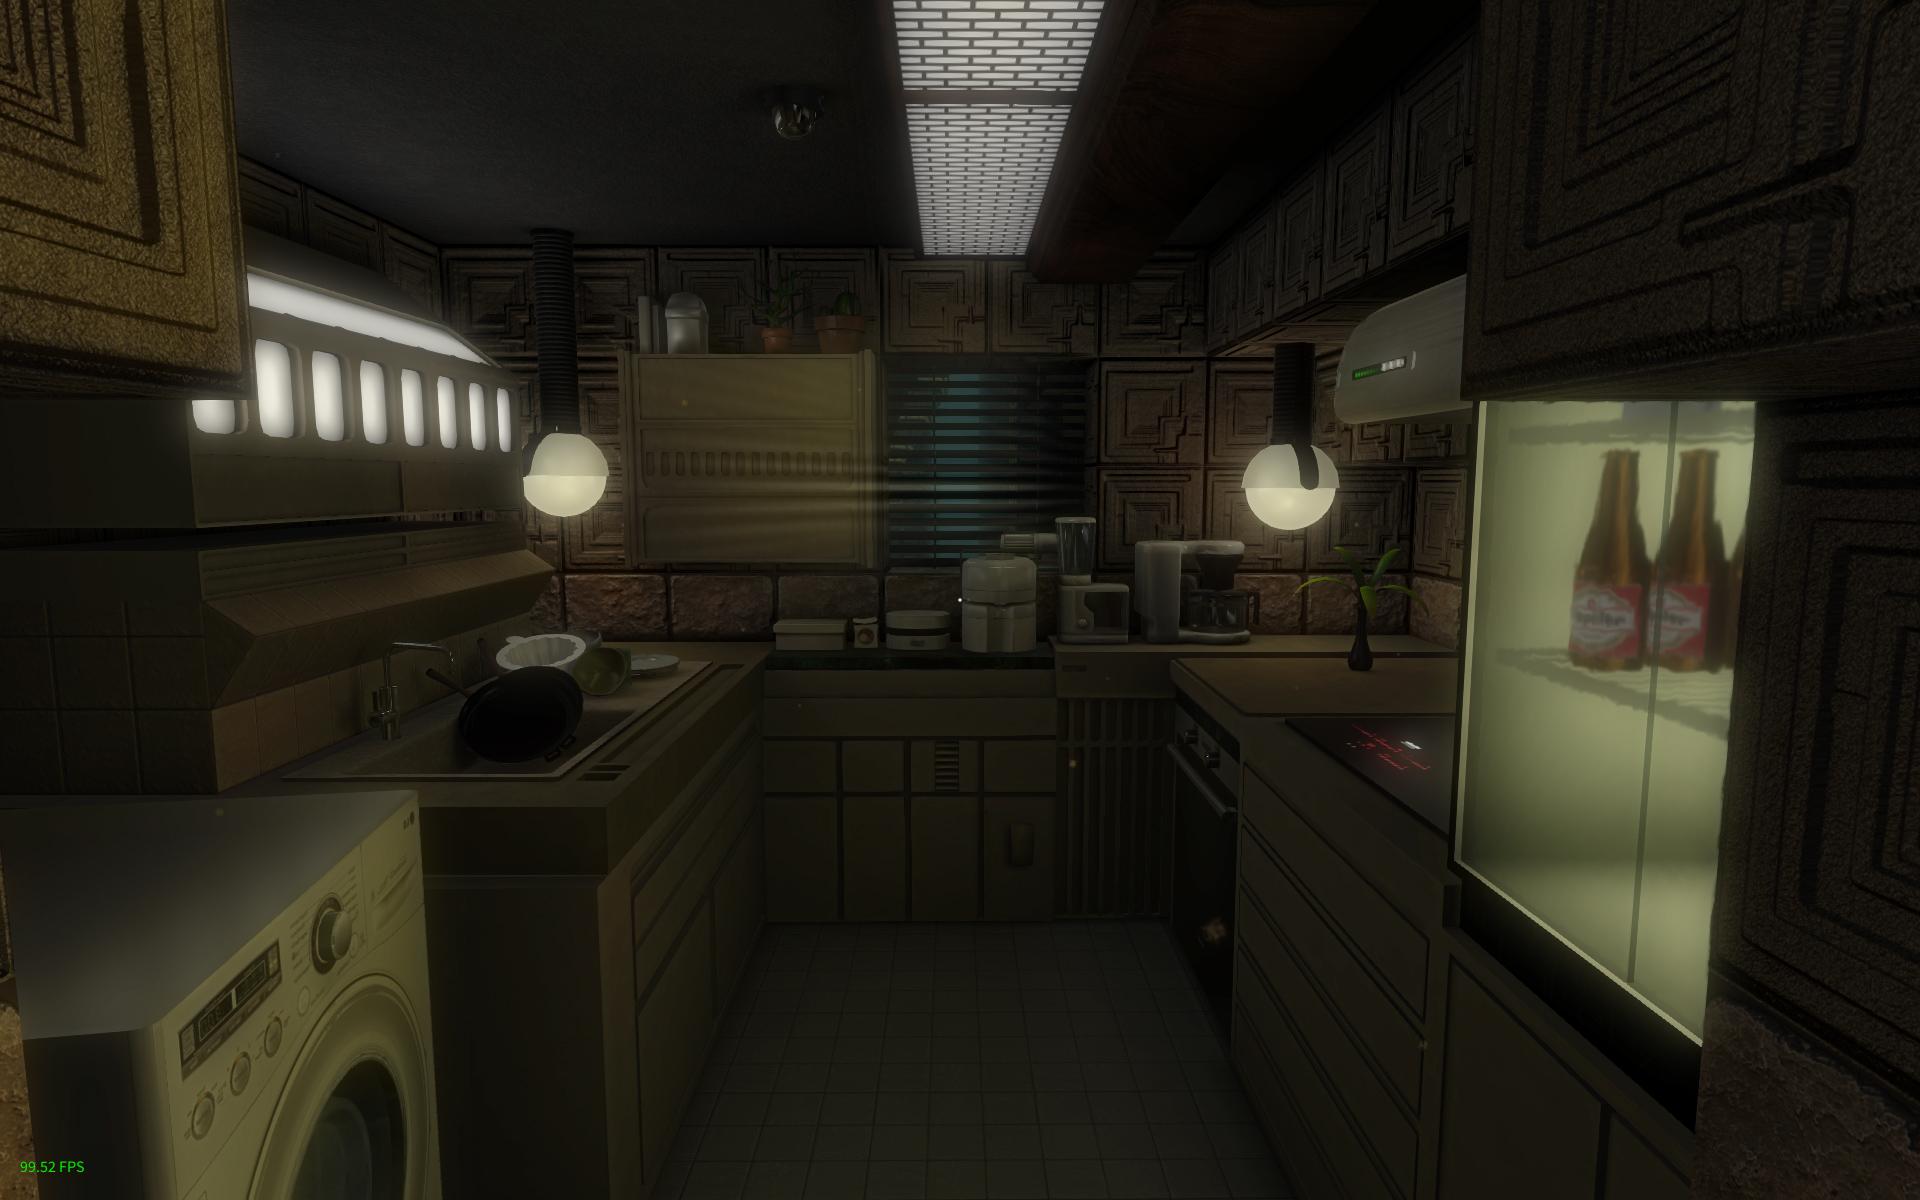 Runner S Kitchen Reviews